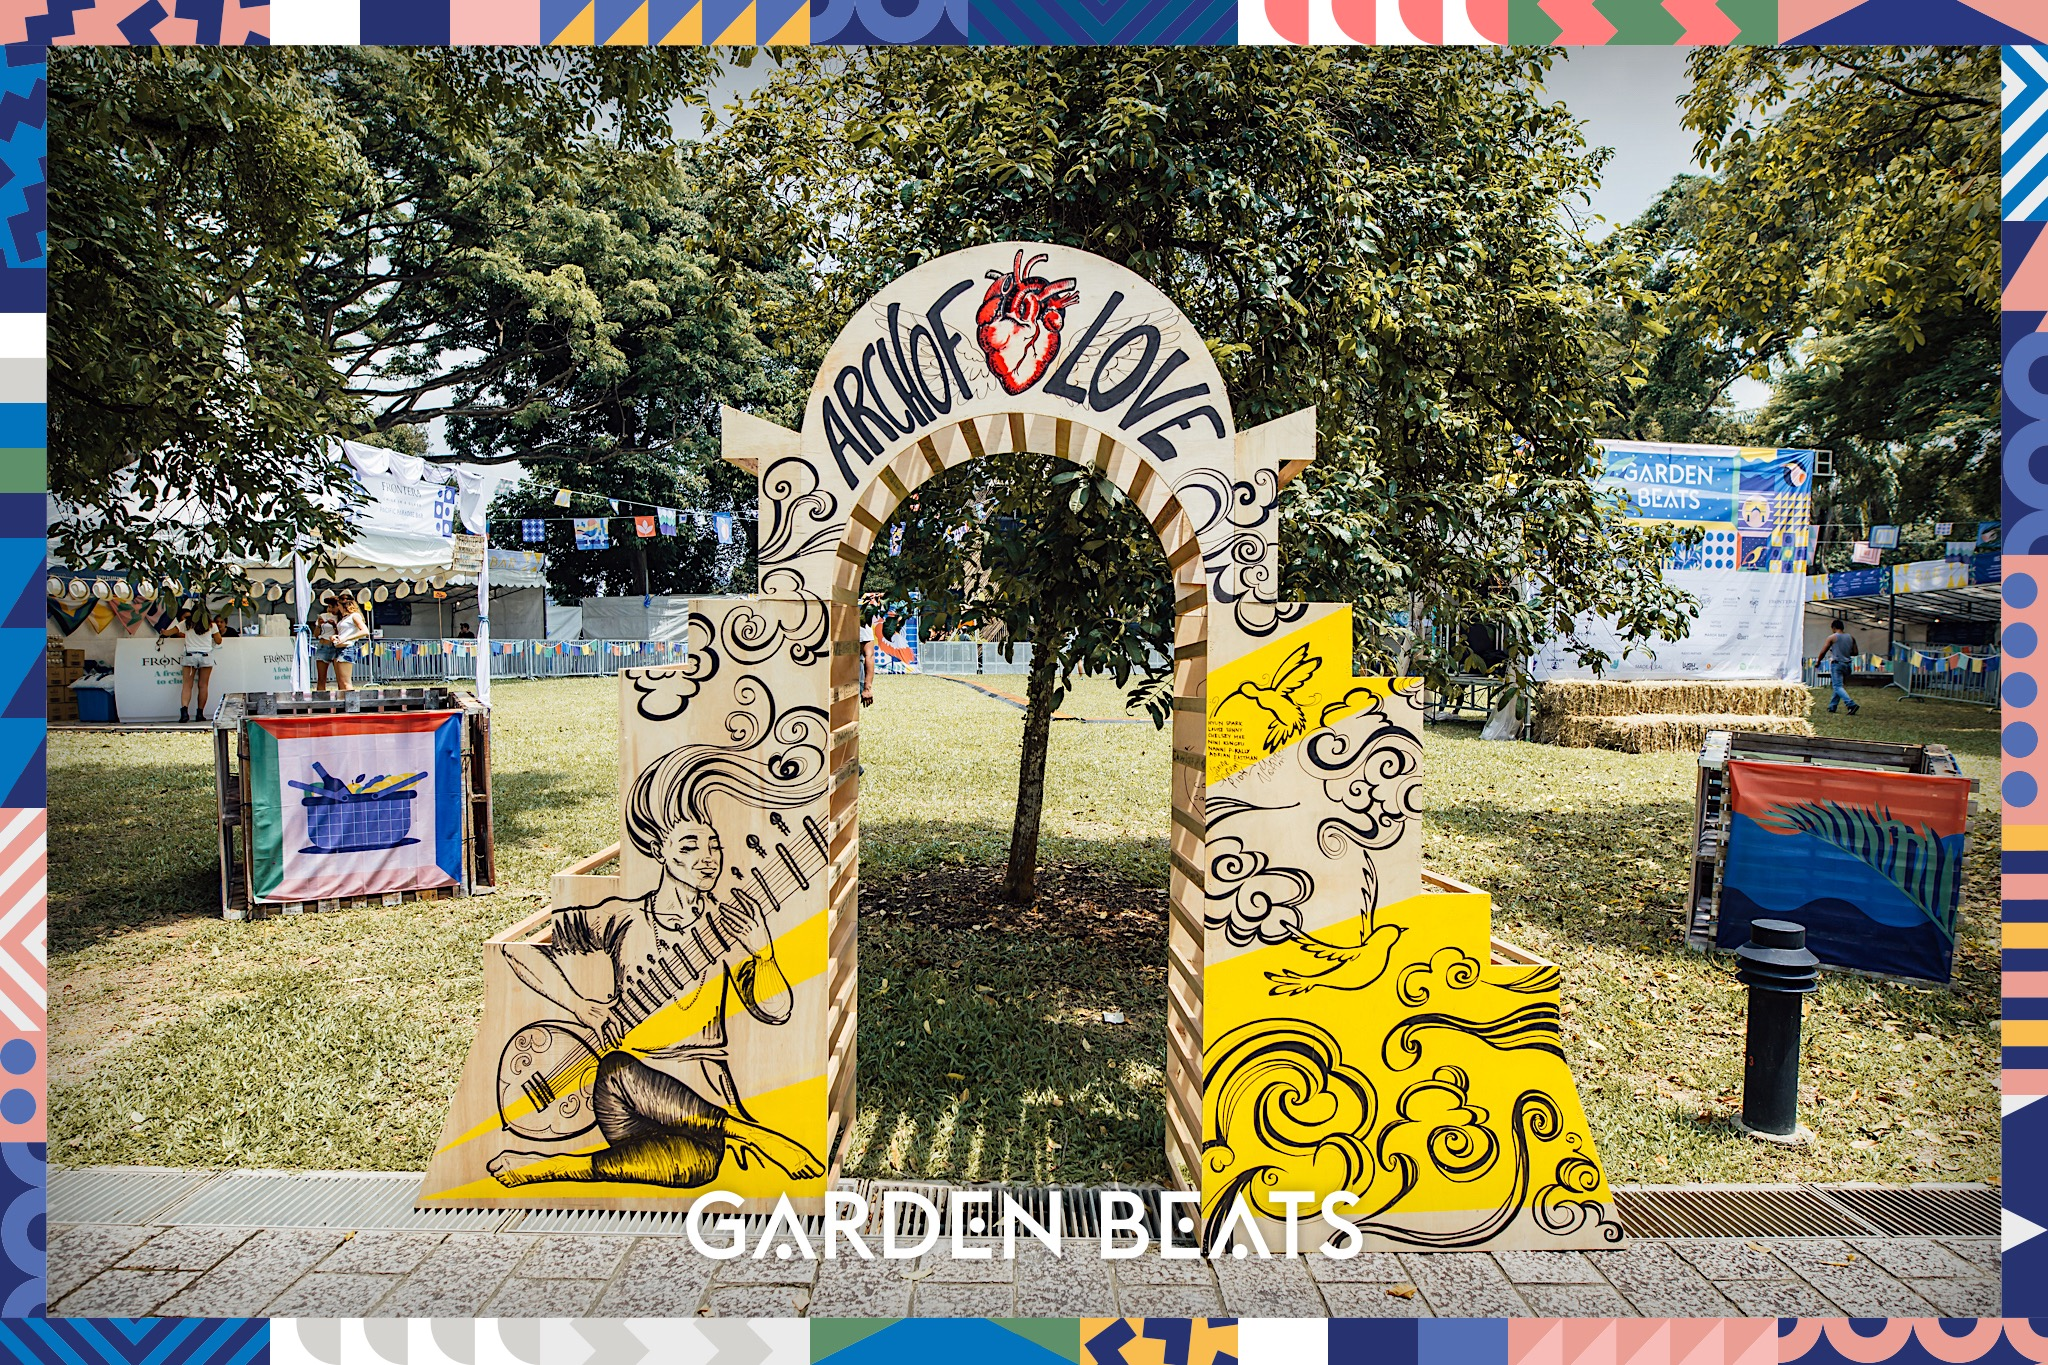 18032017_GardenBeats_Colossal028_WatermarkedGB.jpg